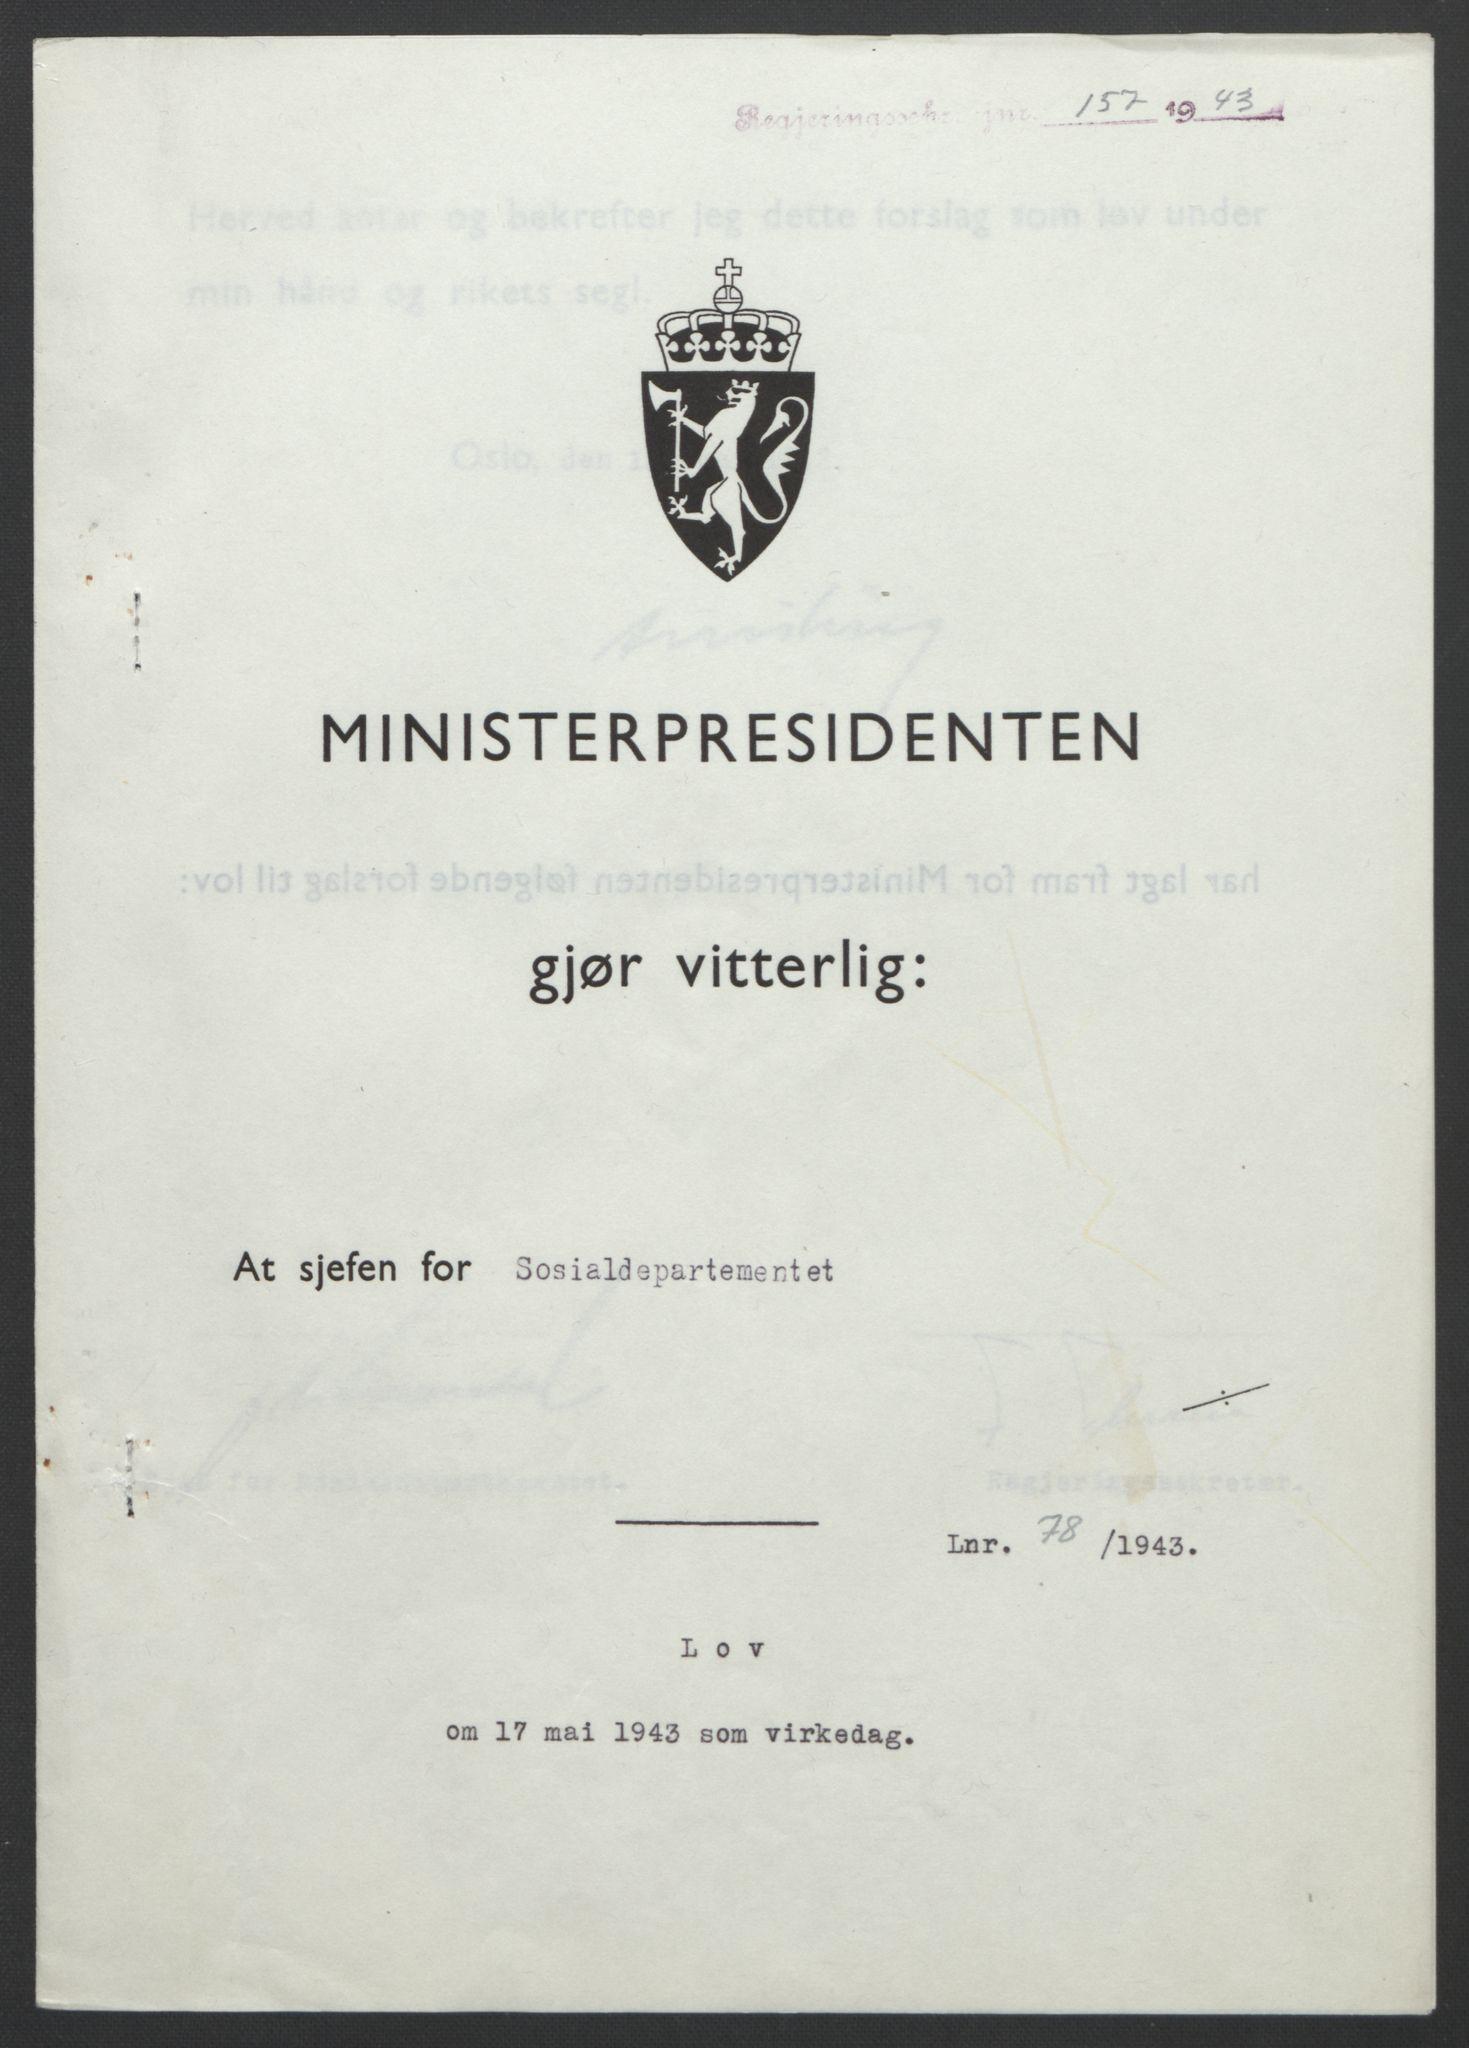 RA, NS-administrasjonen 1940-1945 (Statsrådsekretariatet, de kommisariske statsråder mm), D/Db/L0099: Lover, 1943, s. 357